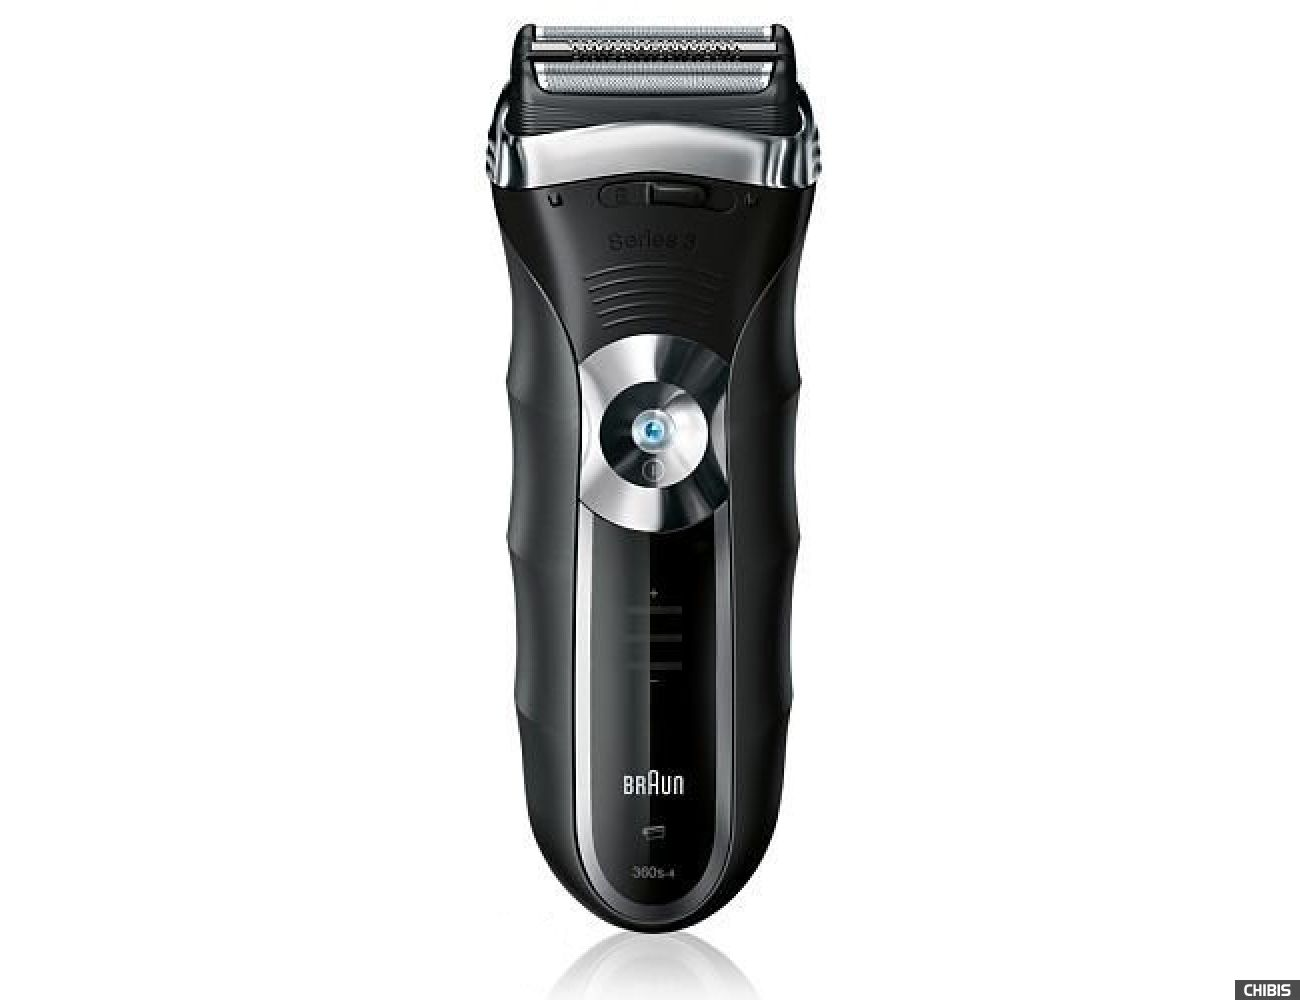 Электробритва Braun 360s-4 Series 3